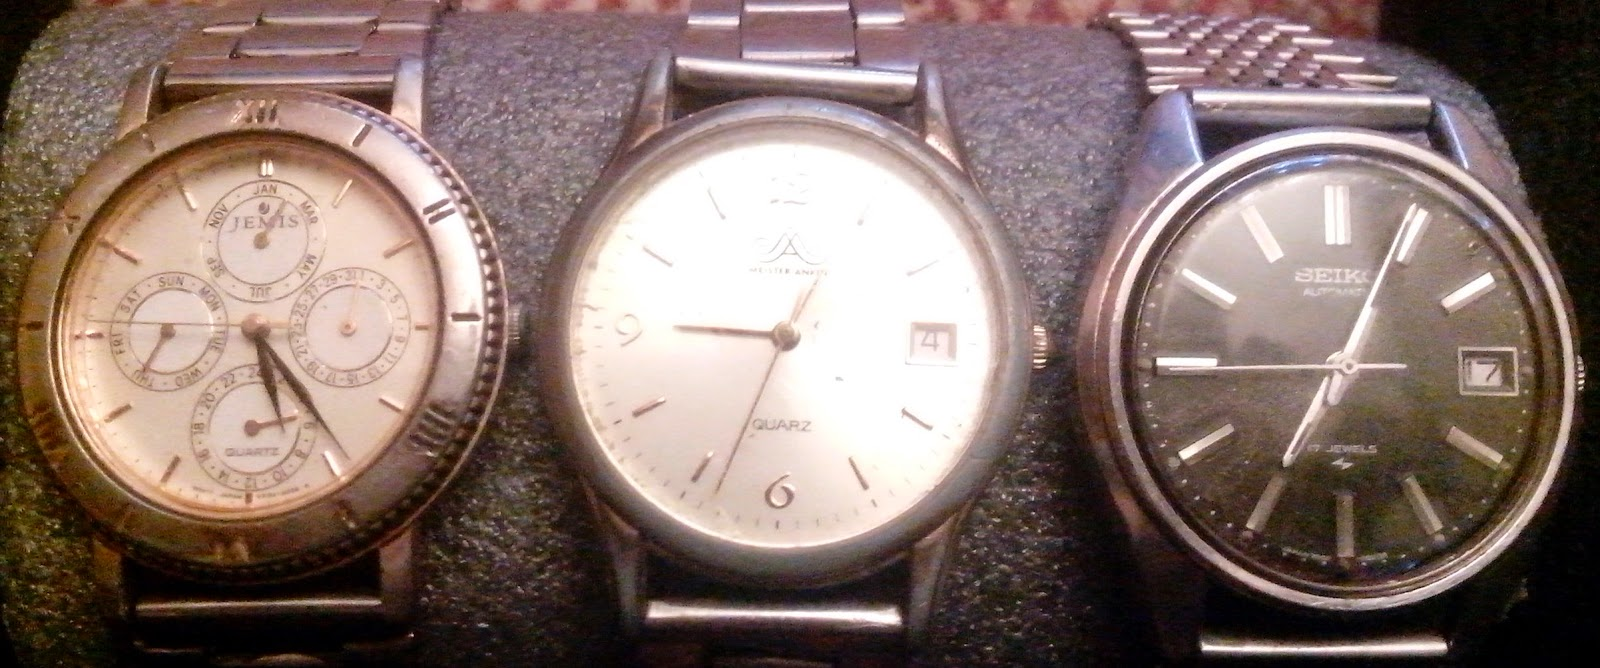 Ce secrete ascund ceasurile vechi si noi?